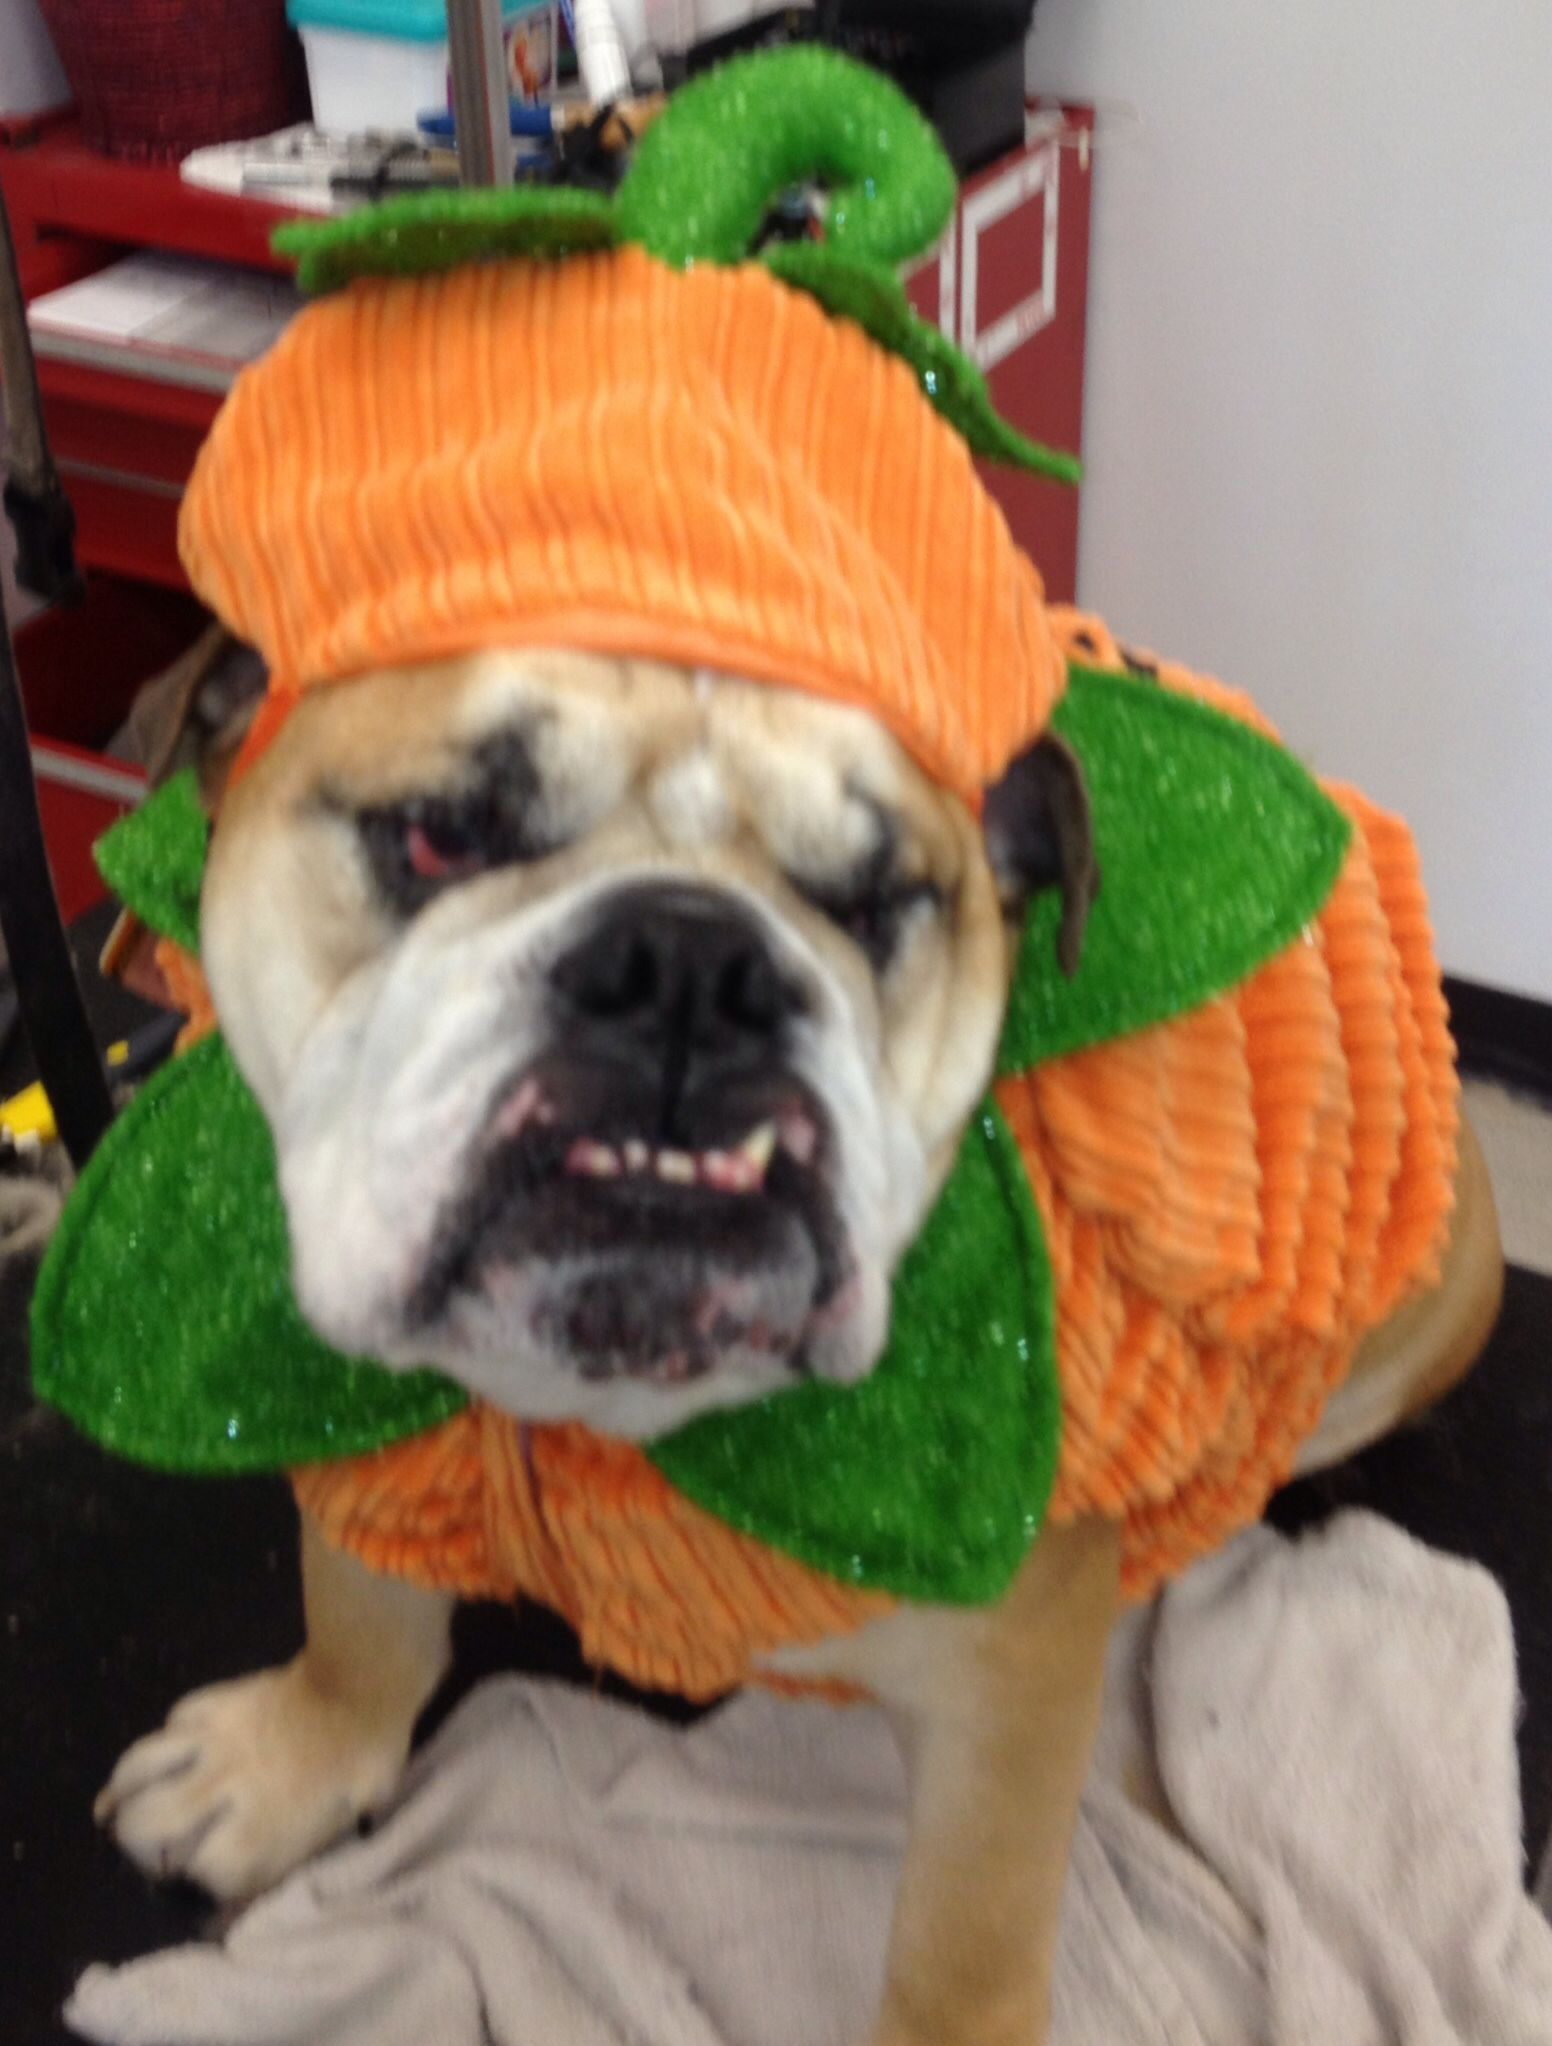 Winston as a pumpkin on Halloween-his bday!